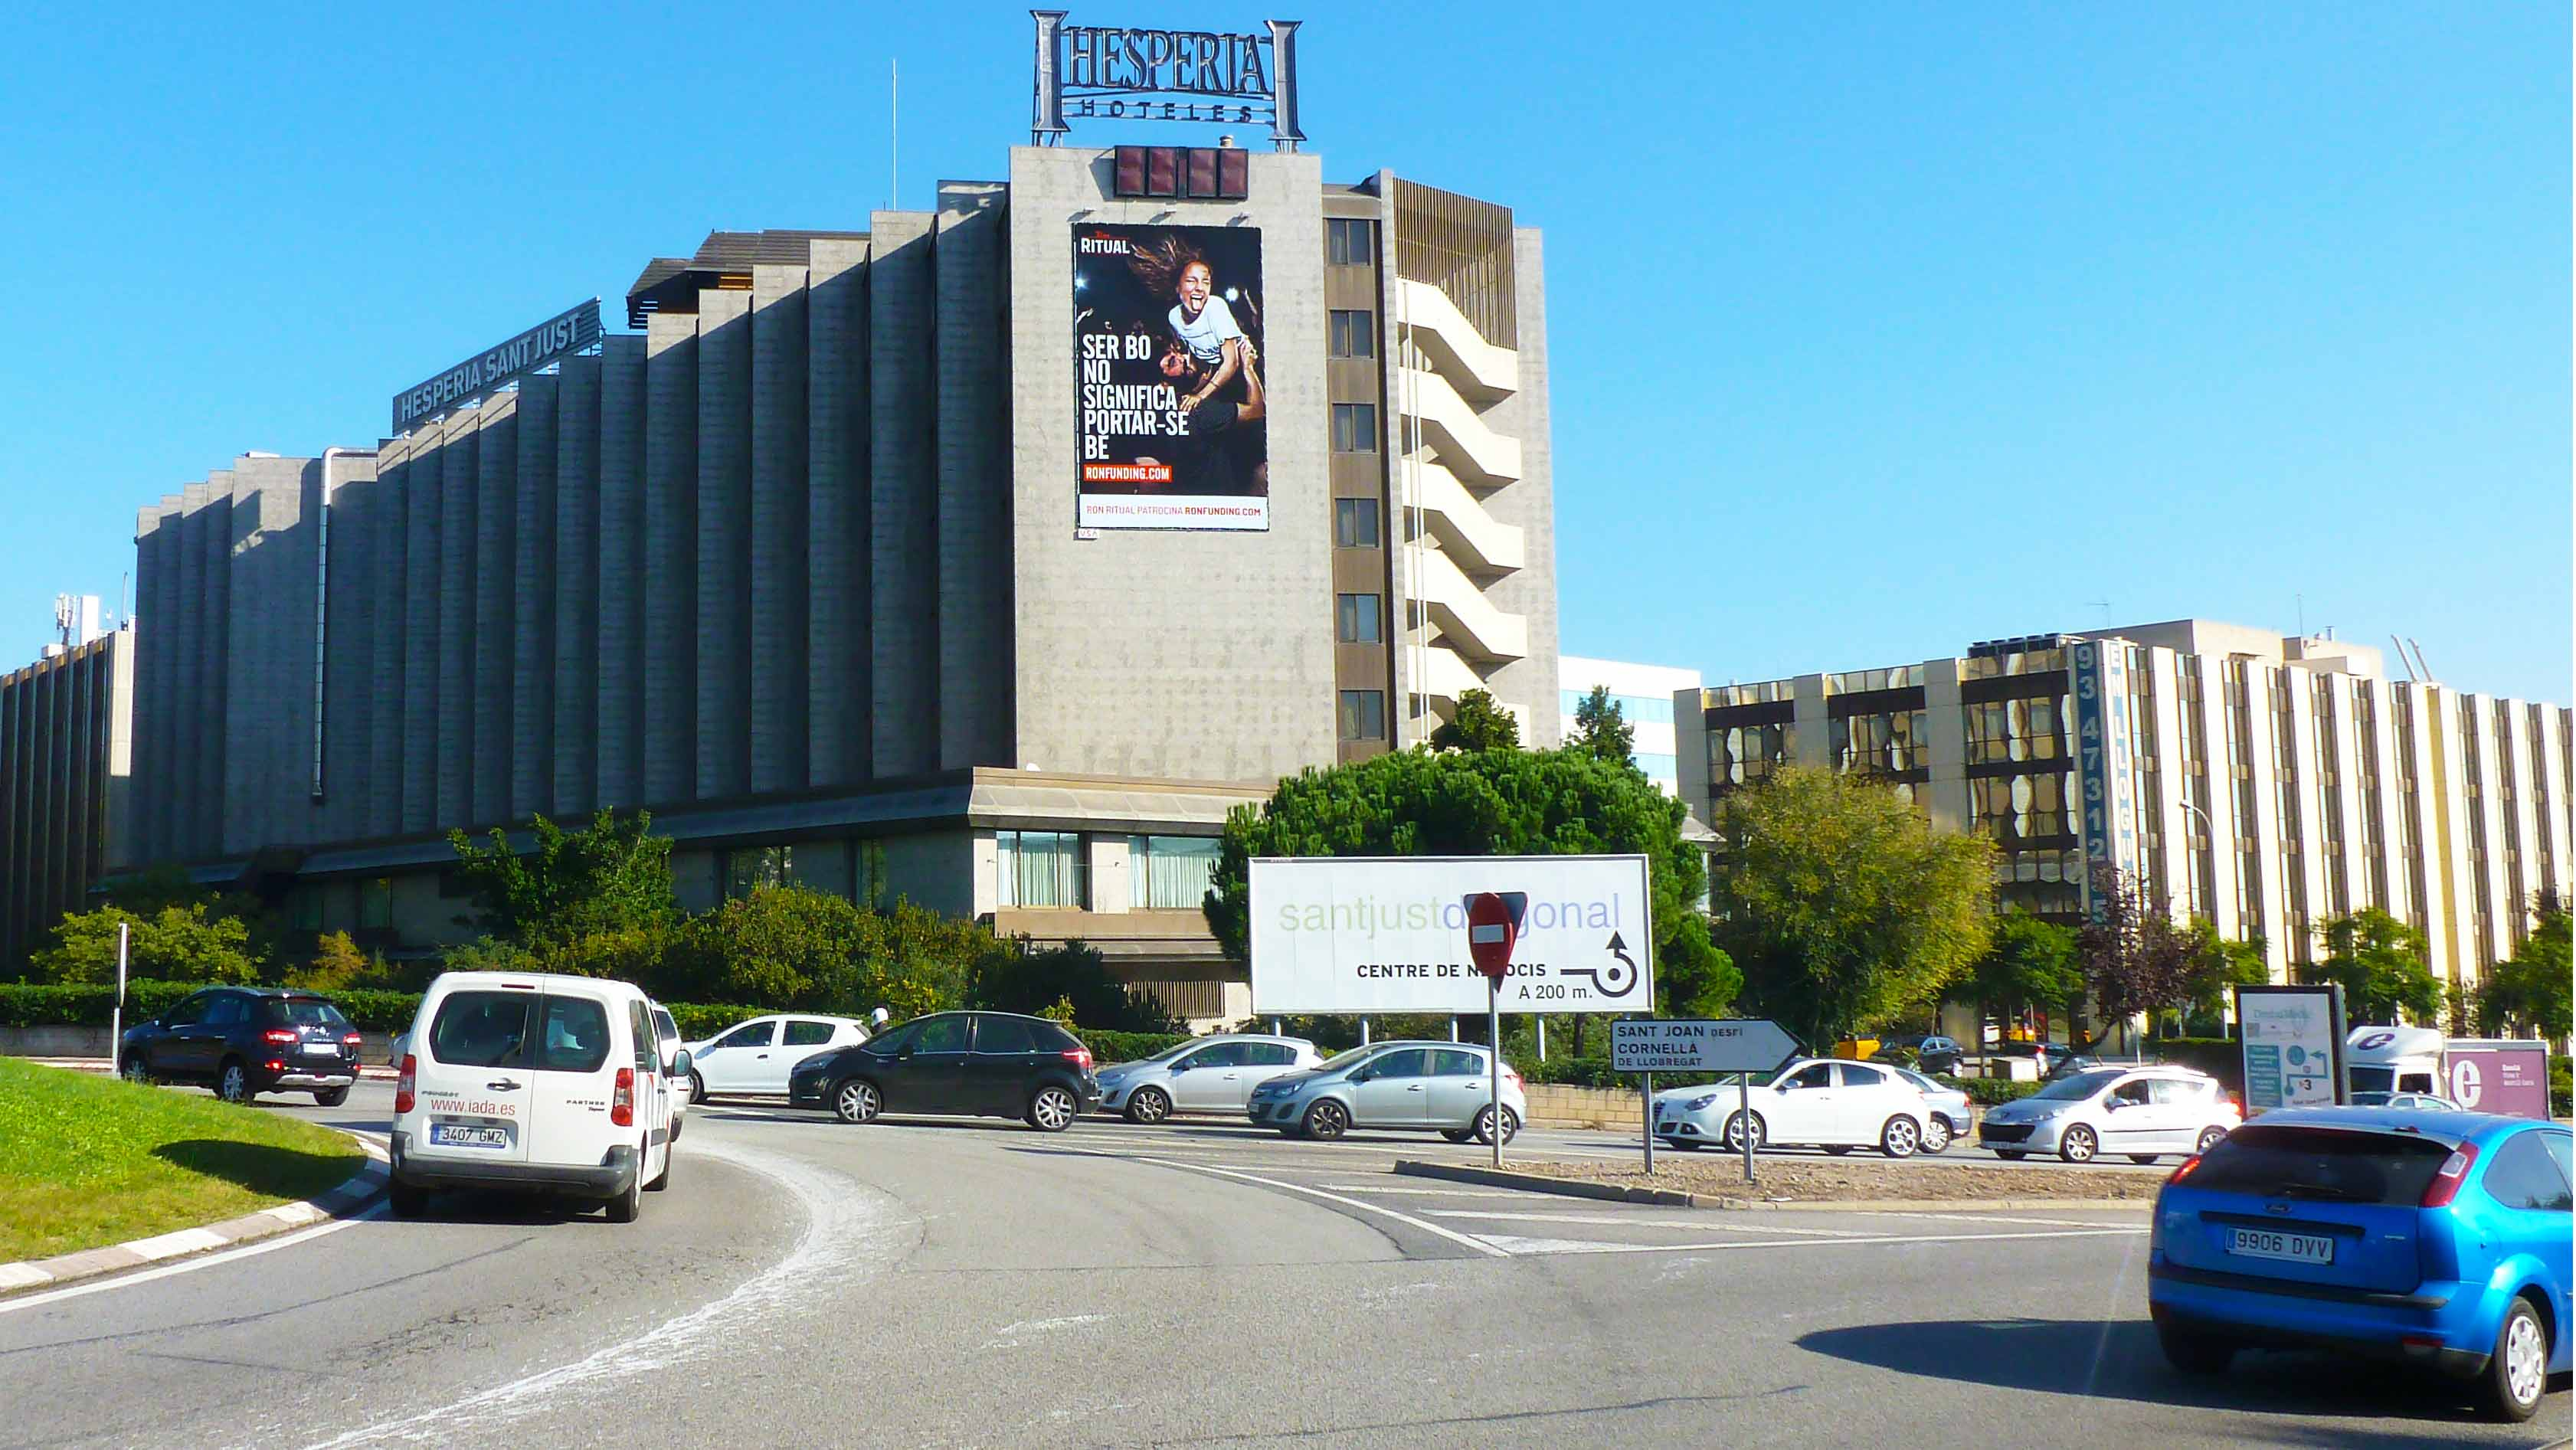 pym-medianera-publicidad-exterior-ron-ritual-hesperia-barcelona-vsa-comunicacion